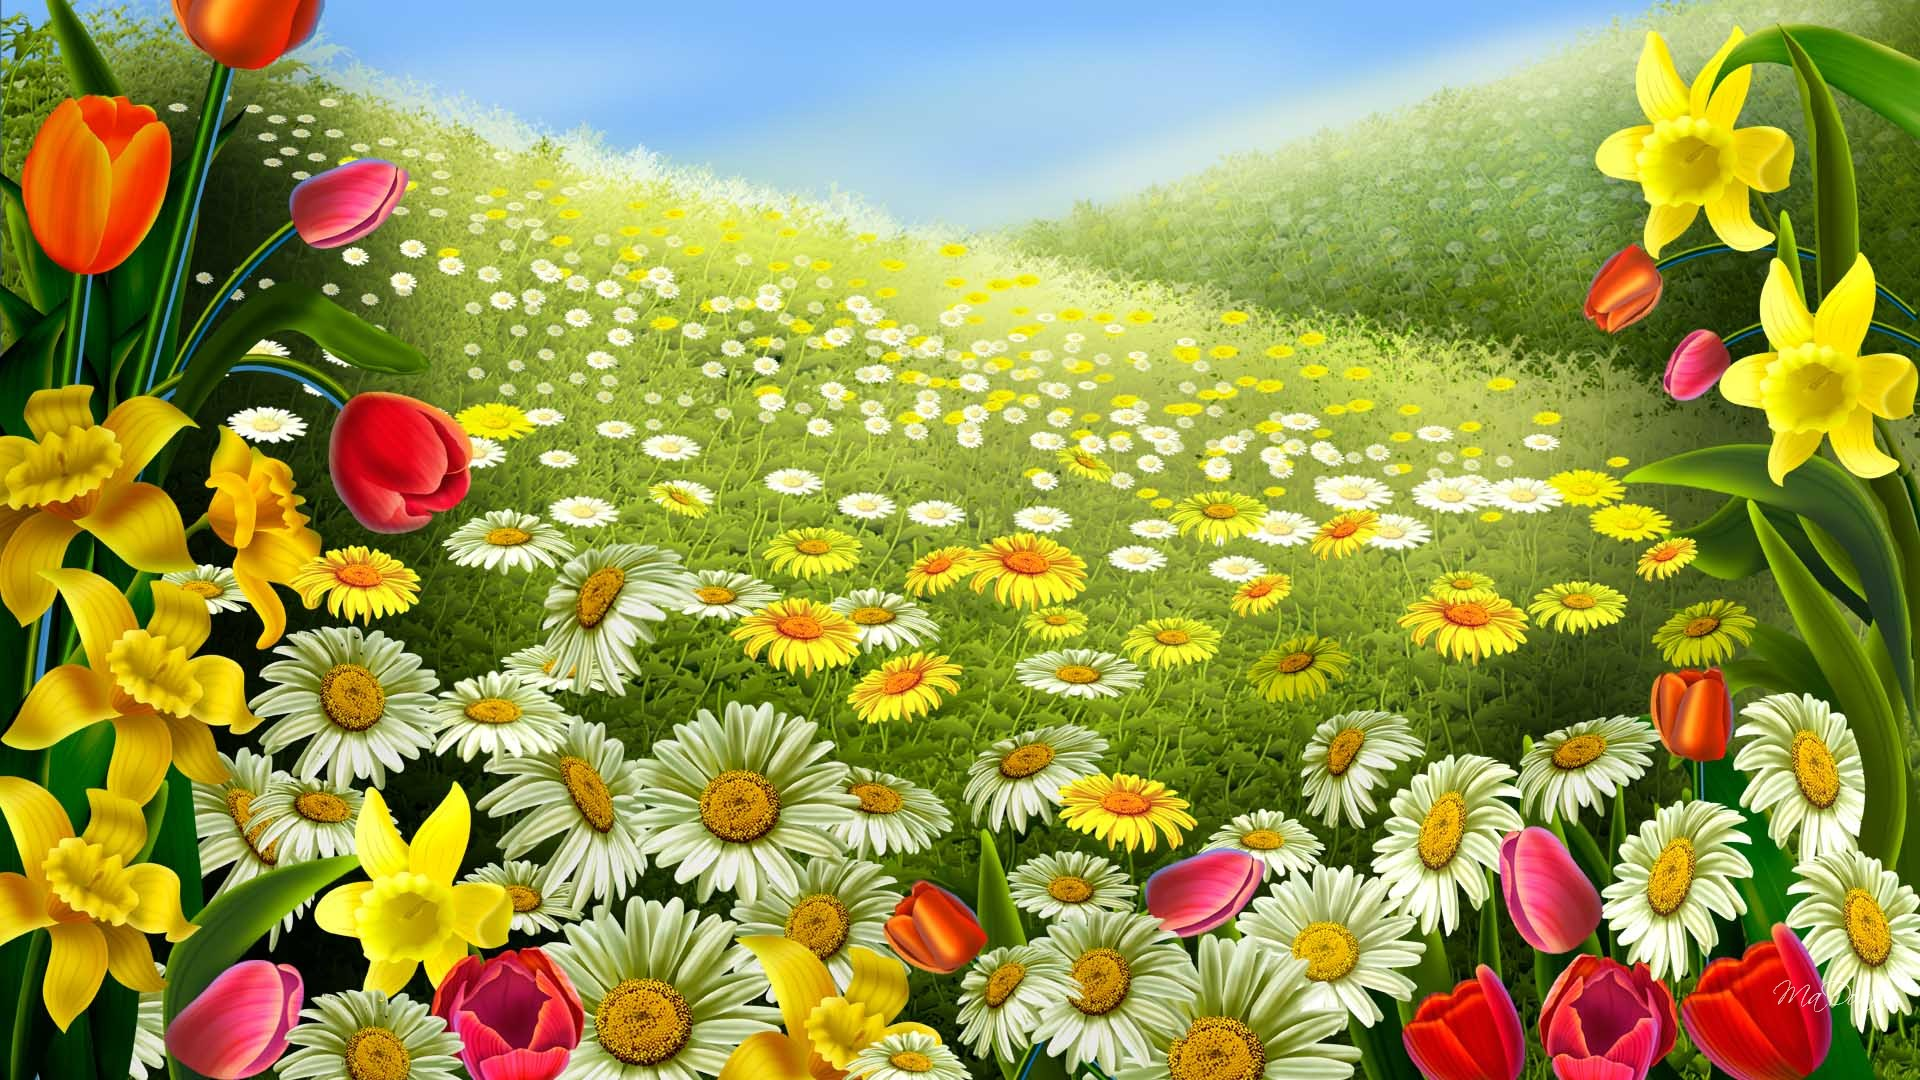 Pics Photos   For Desktop Download Spring Flowers 1920x1080